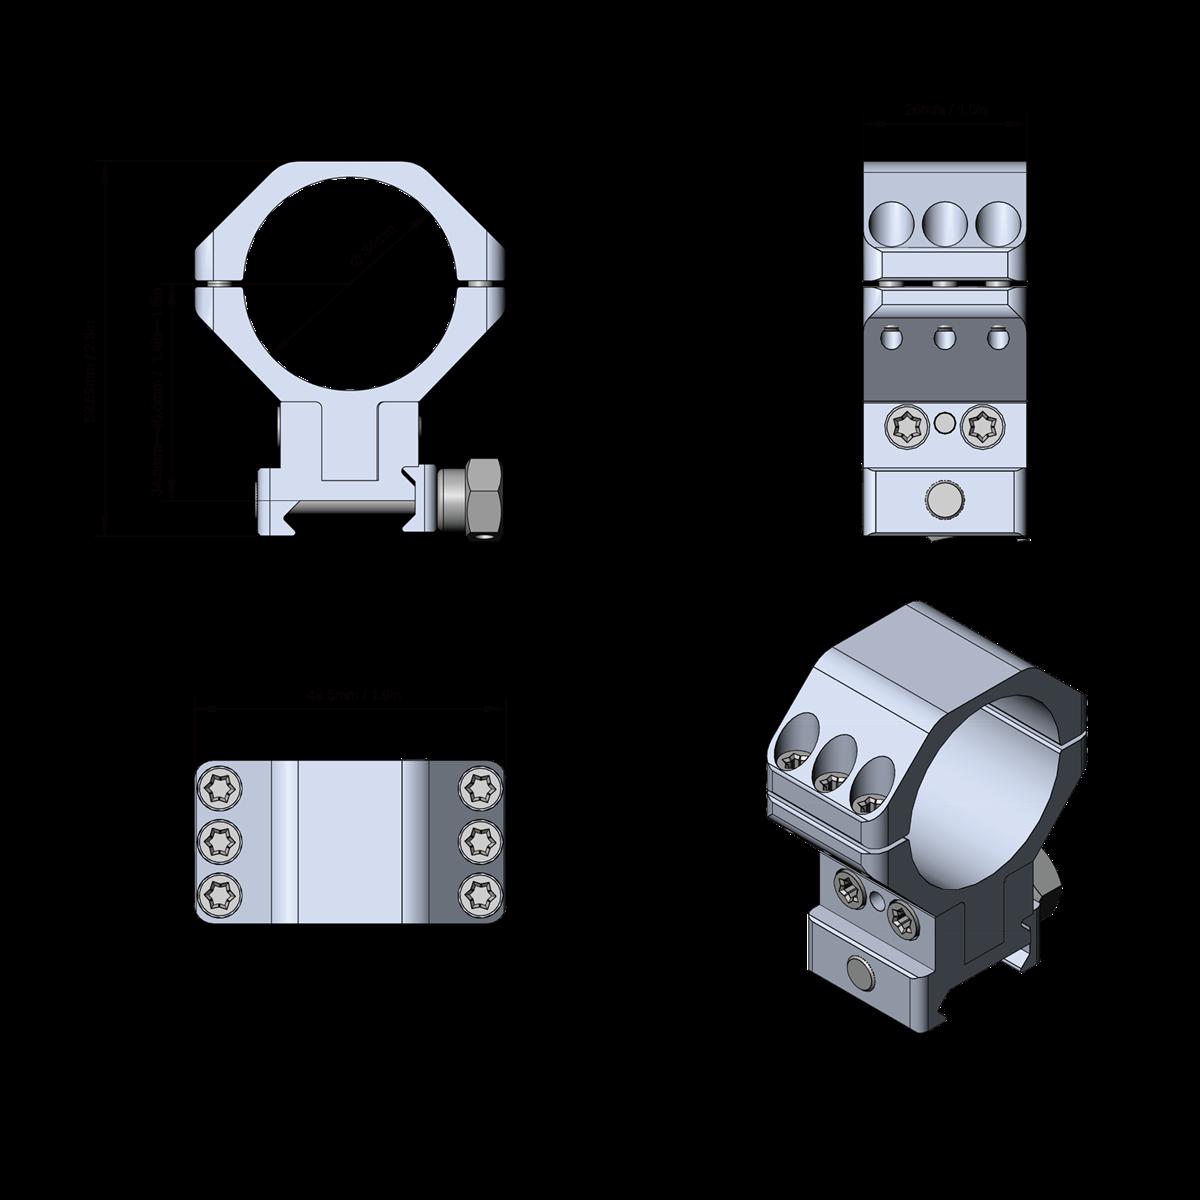 XASR-3050 Diagram